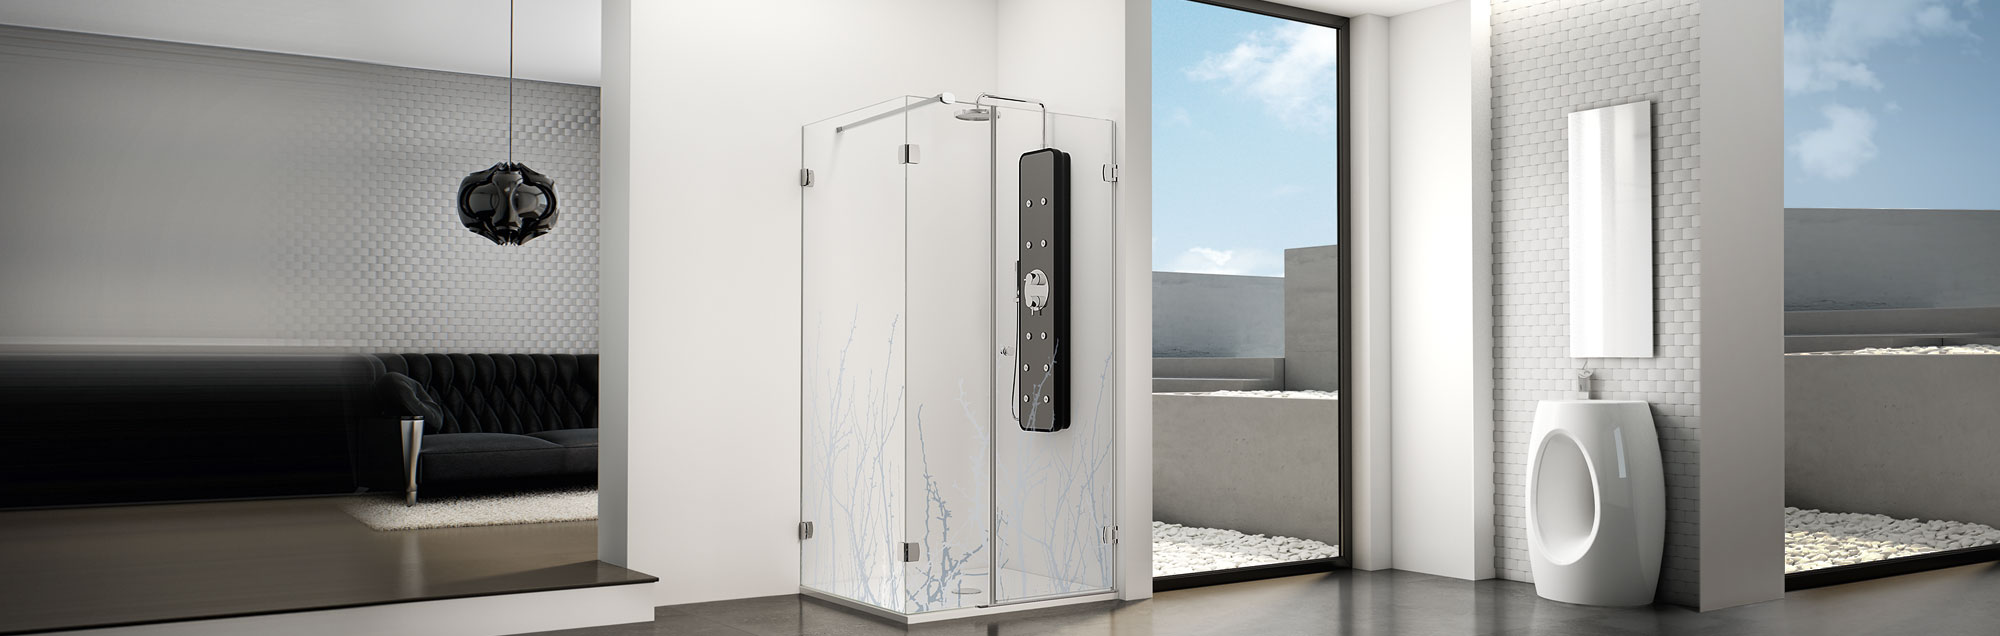 Box doccia battentii per doccia e vasca da bagno su misura PROFILTEK